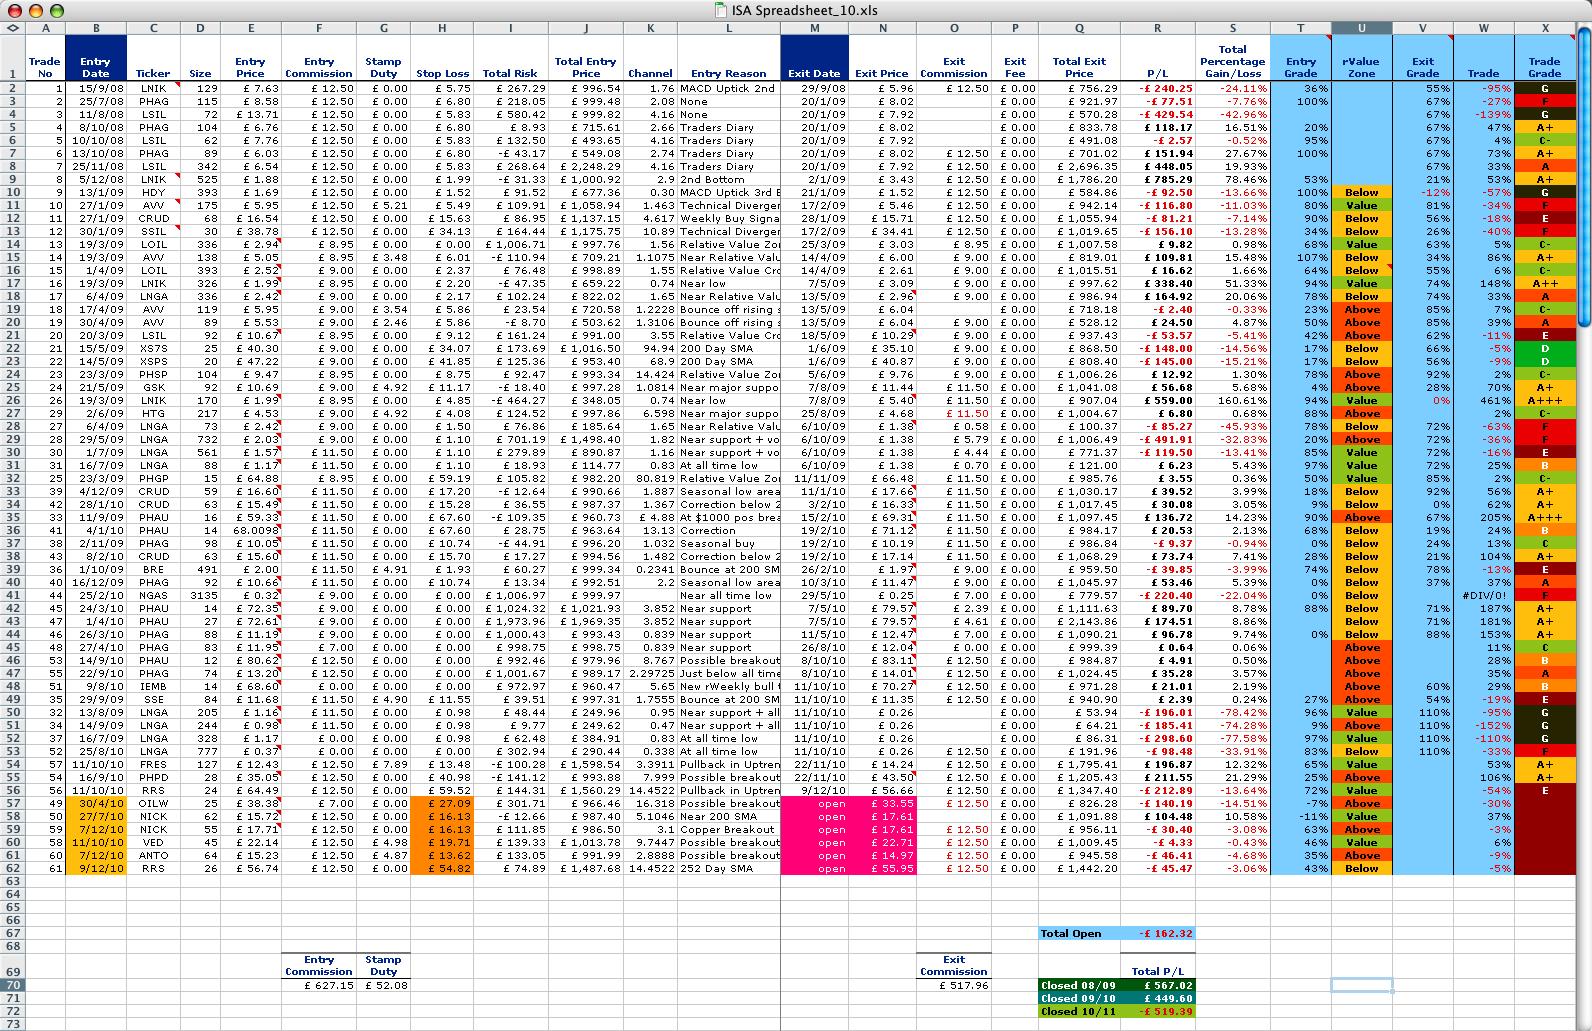 isa_spreadsheet_10-12-10.png